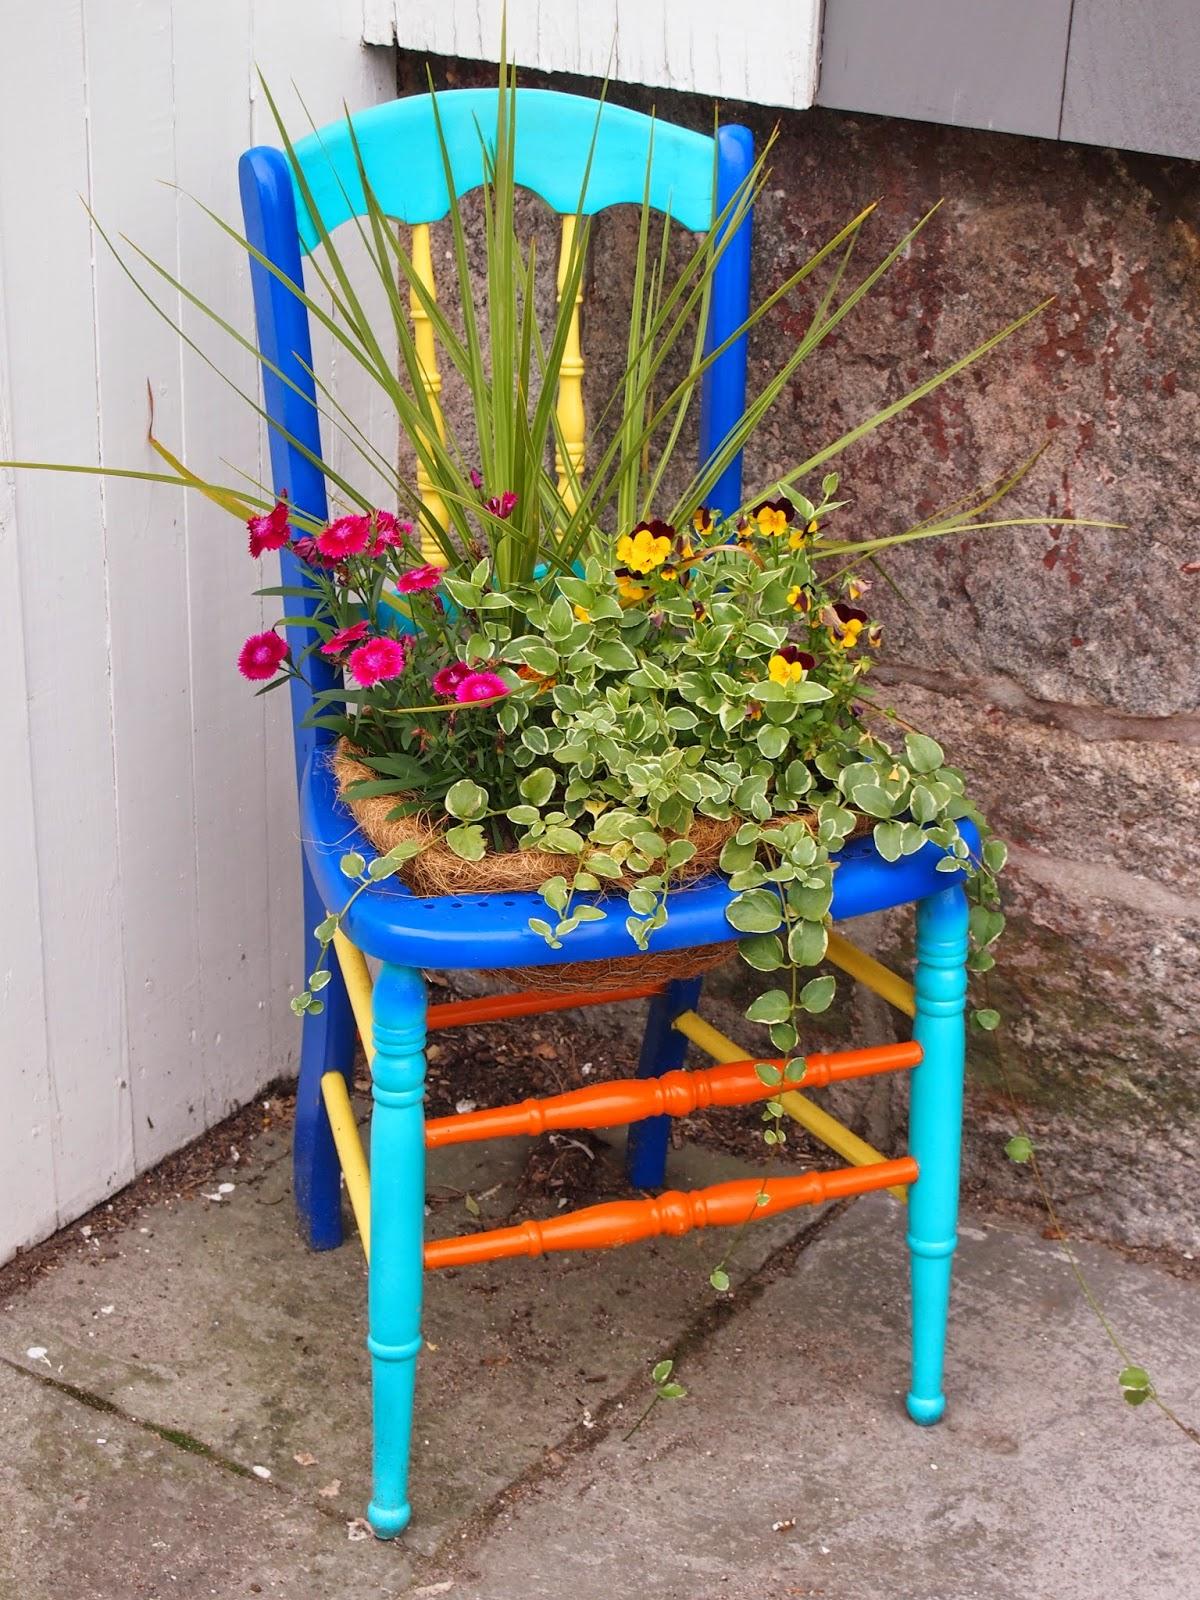 Artistic chair in Stonington Borough